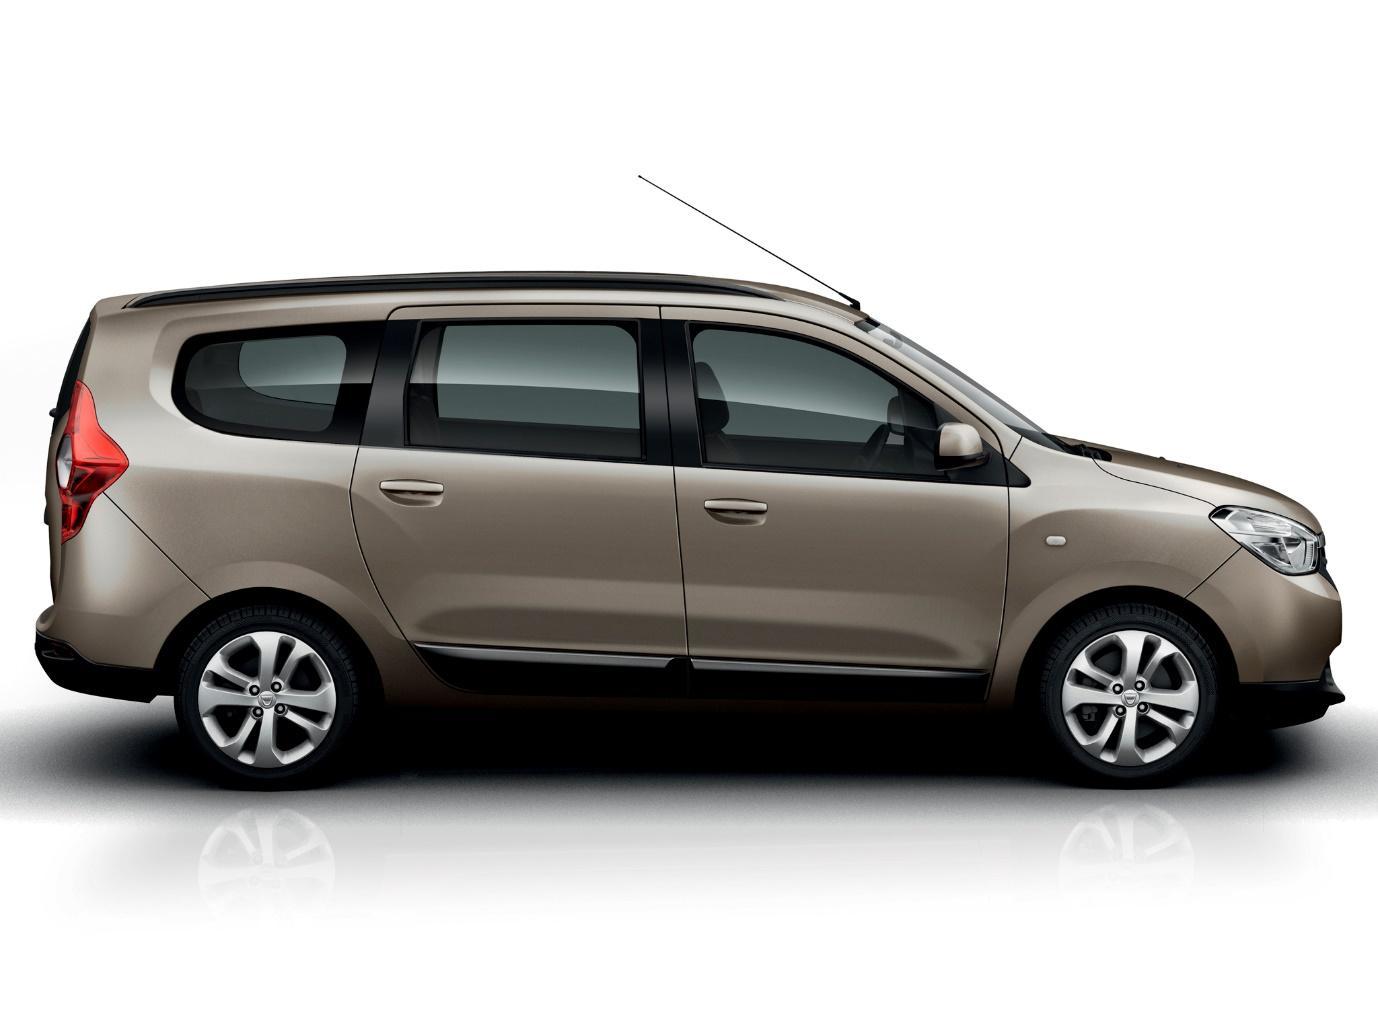 https://www.autossegredos.com.br/wp-content/uploads/2012/03/Renault-Lodgy-2013-6.jpg